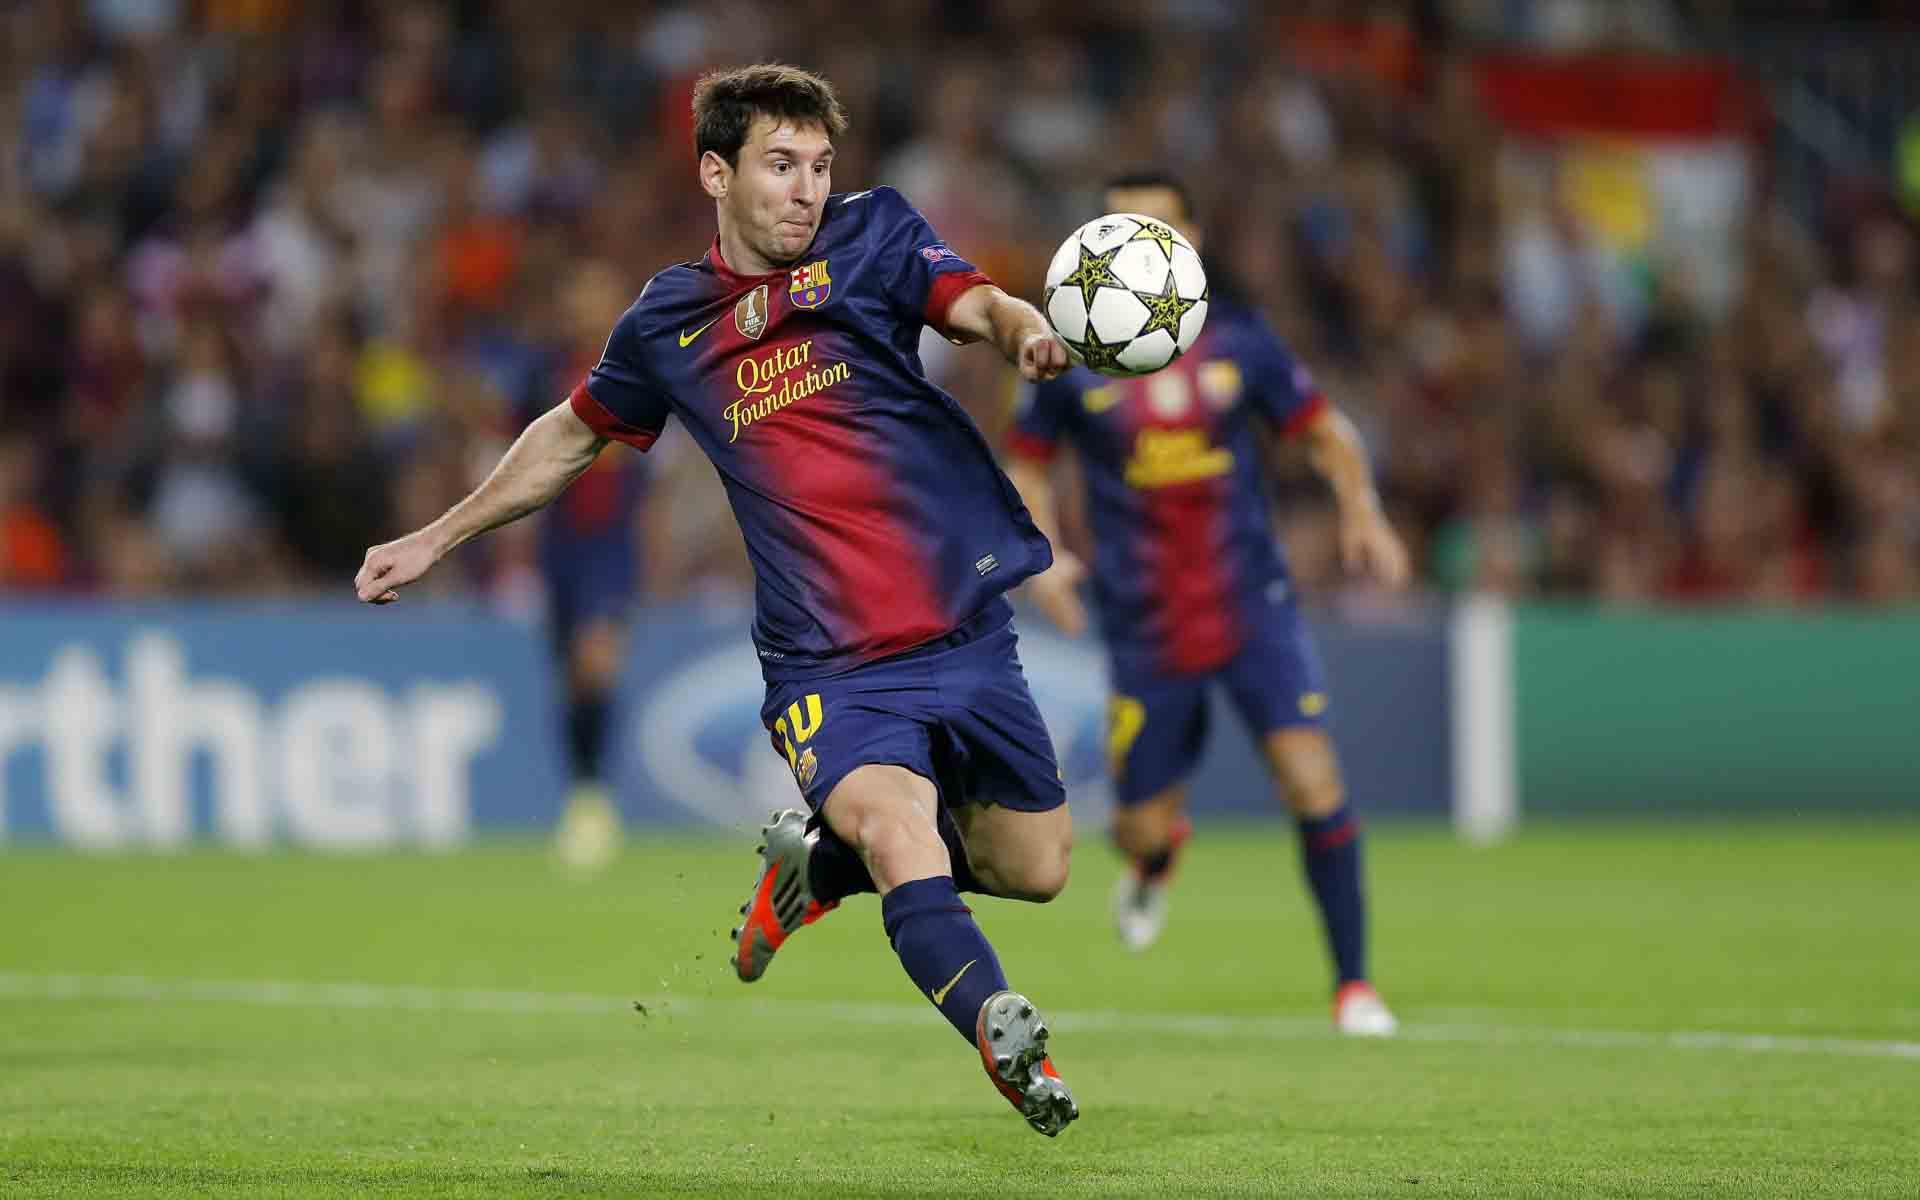 Lionel-Messi-HD-Wallpaper-Barcelona-FC-2017-07